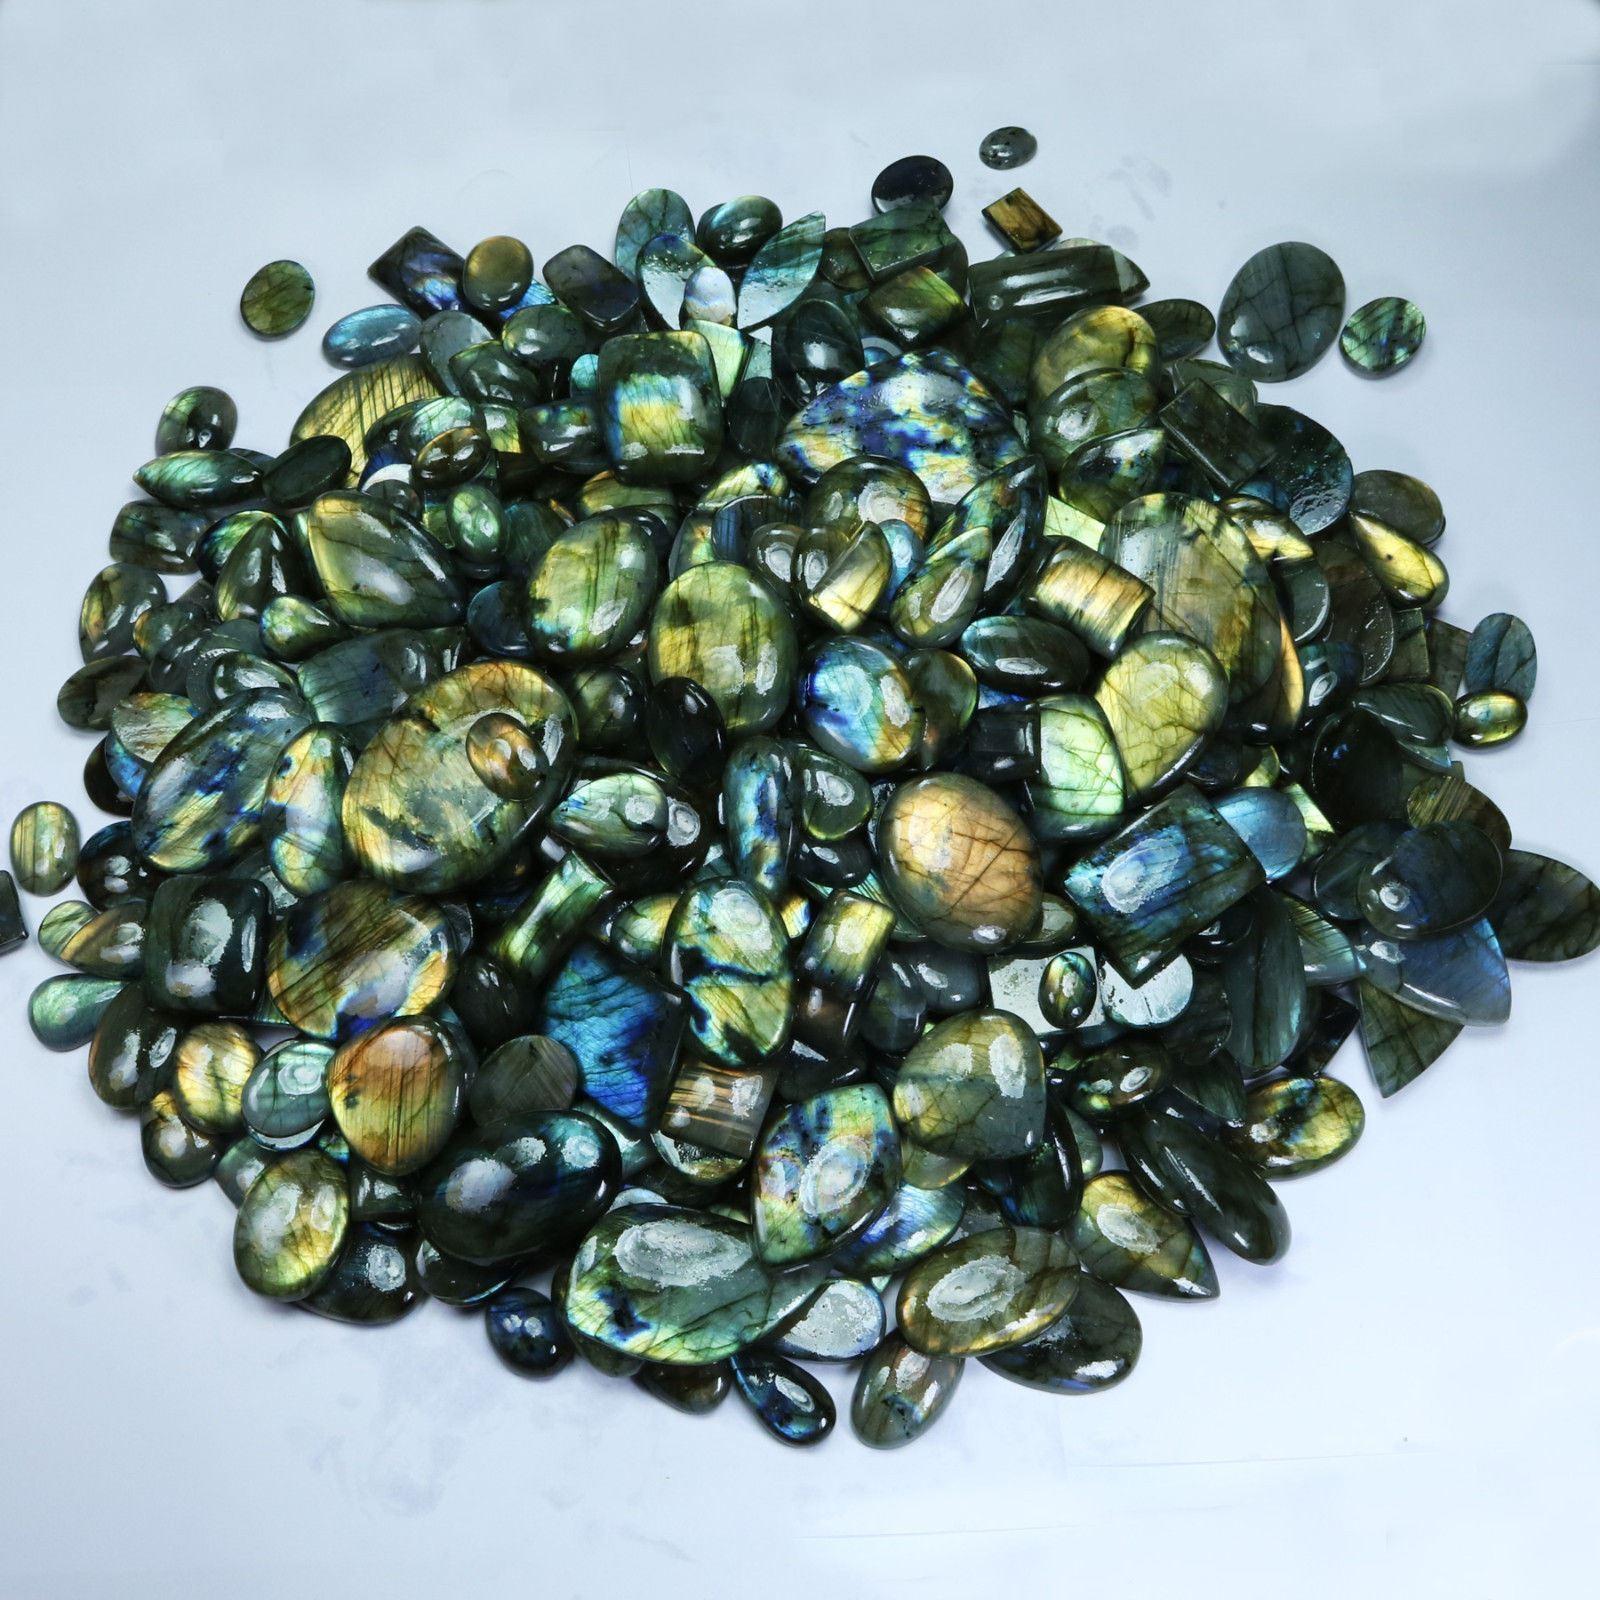 5000Crt. Natural Labradorite Multi Flash Mix Cabochon Loose Gemstone 100Pcs Lot